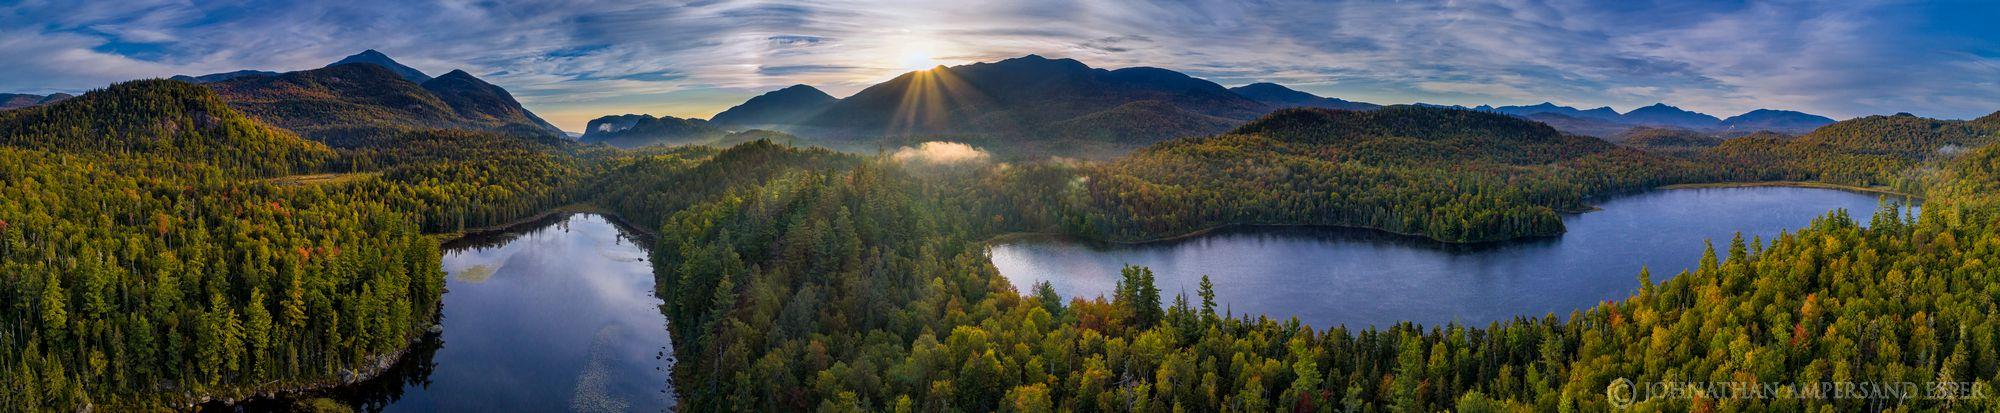 Connery Pond,Long Pond,Whiteface Mt,Whiteface,Whiteface Mountain,Wilmington Notch,Sentinel Range,Adirondacks,Adirondack High Peaks,High Peaks,range,ponds,Adirondack,2019,drone,panorama,September,, photo